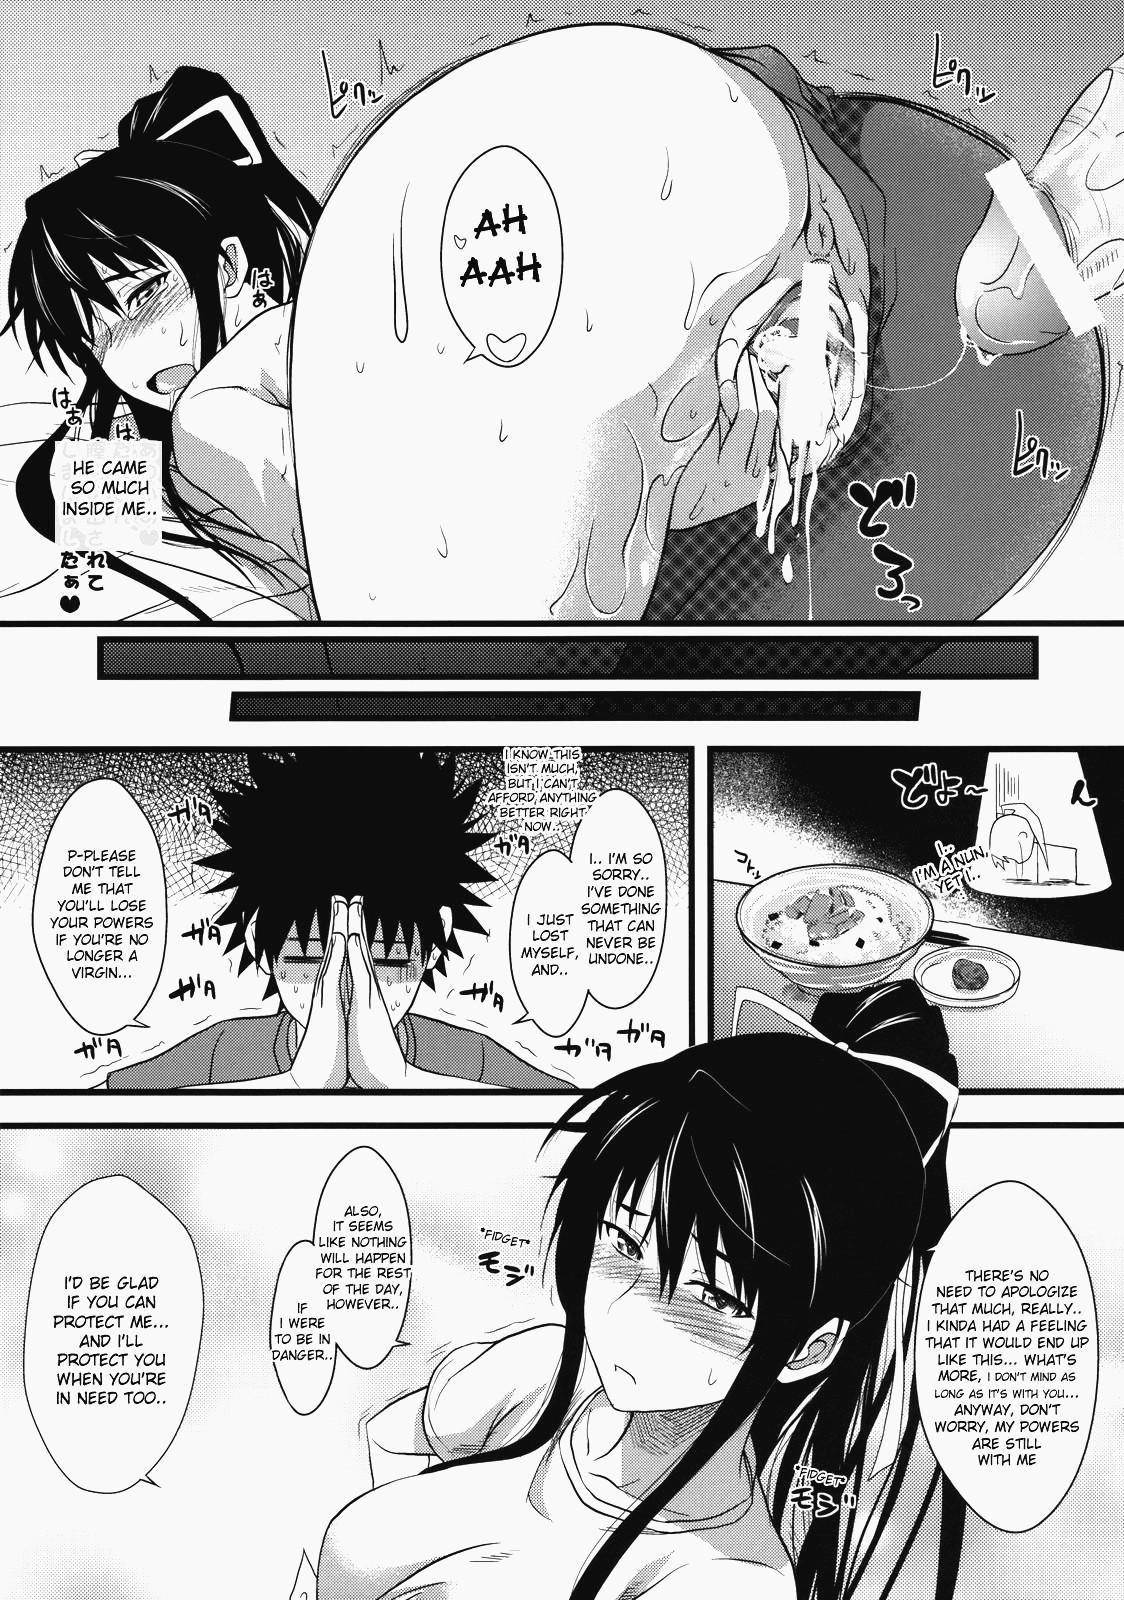 Amakusa Moyouna% page 22